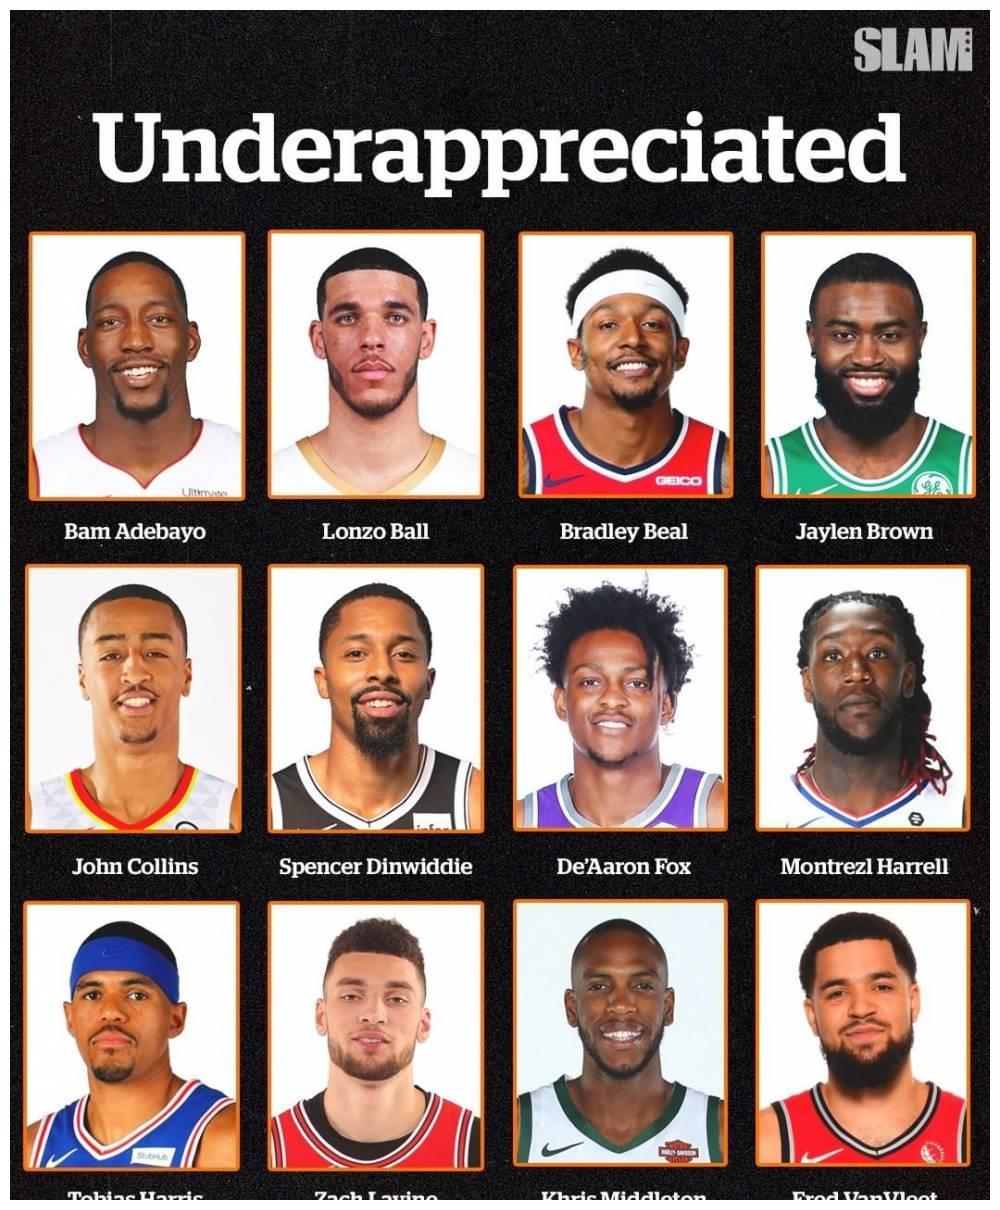 NBA现役被低估的球员都有谁?球哥上榜,场均得分第二最委屈